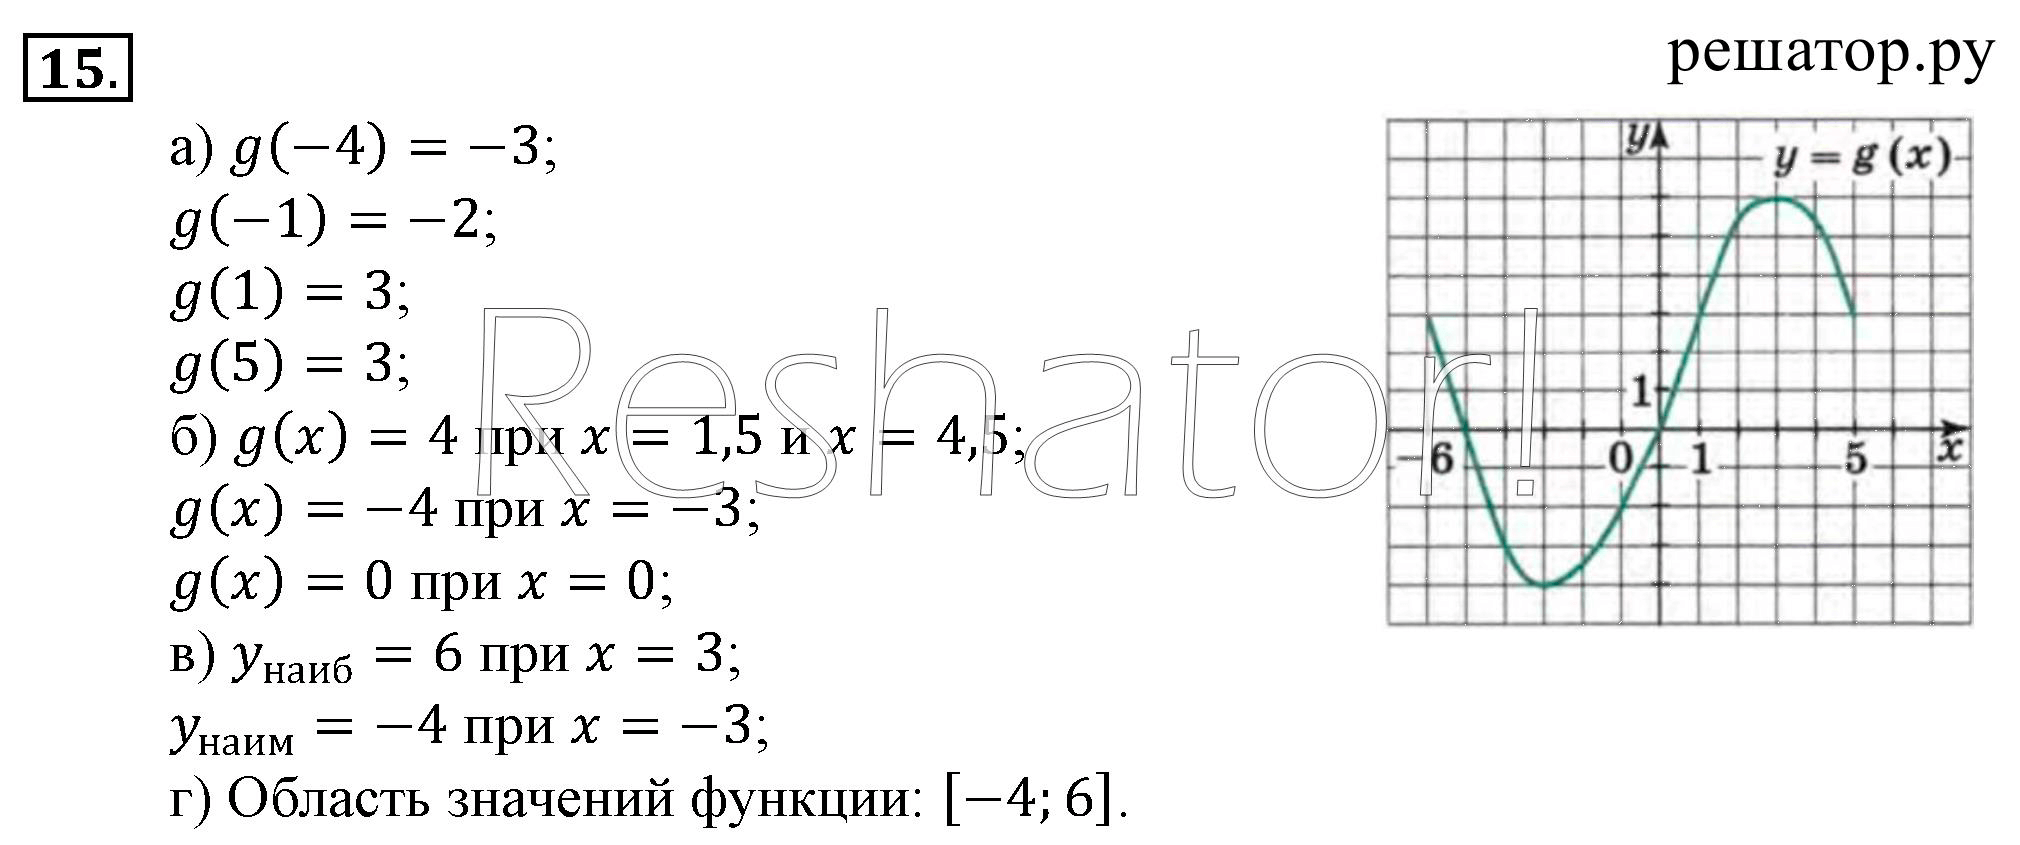 Гдз по алгебре 9 класс 17 издание макарычев миндюк нешков суворова 2018 онлайн